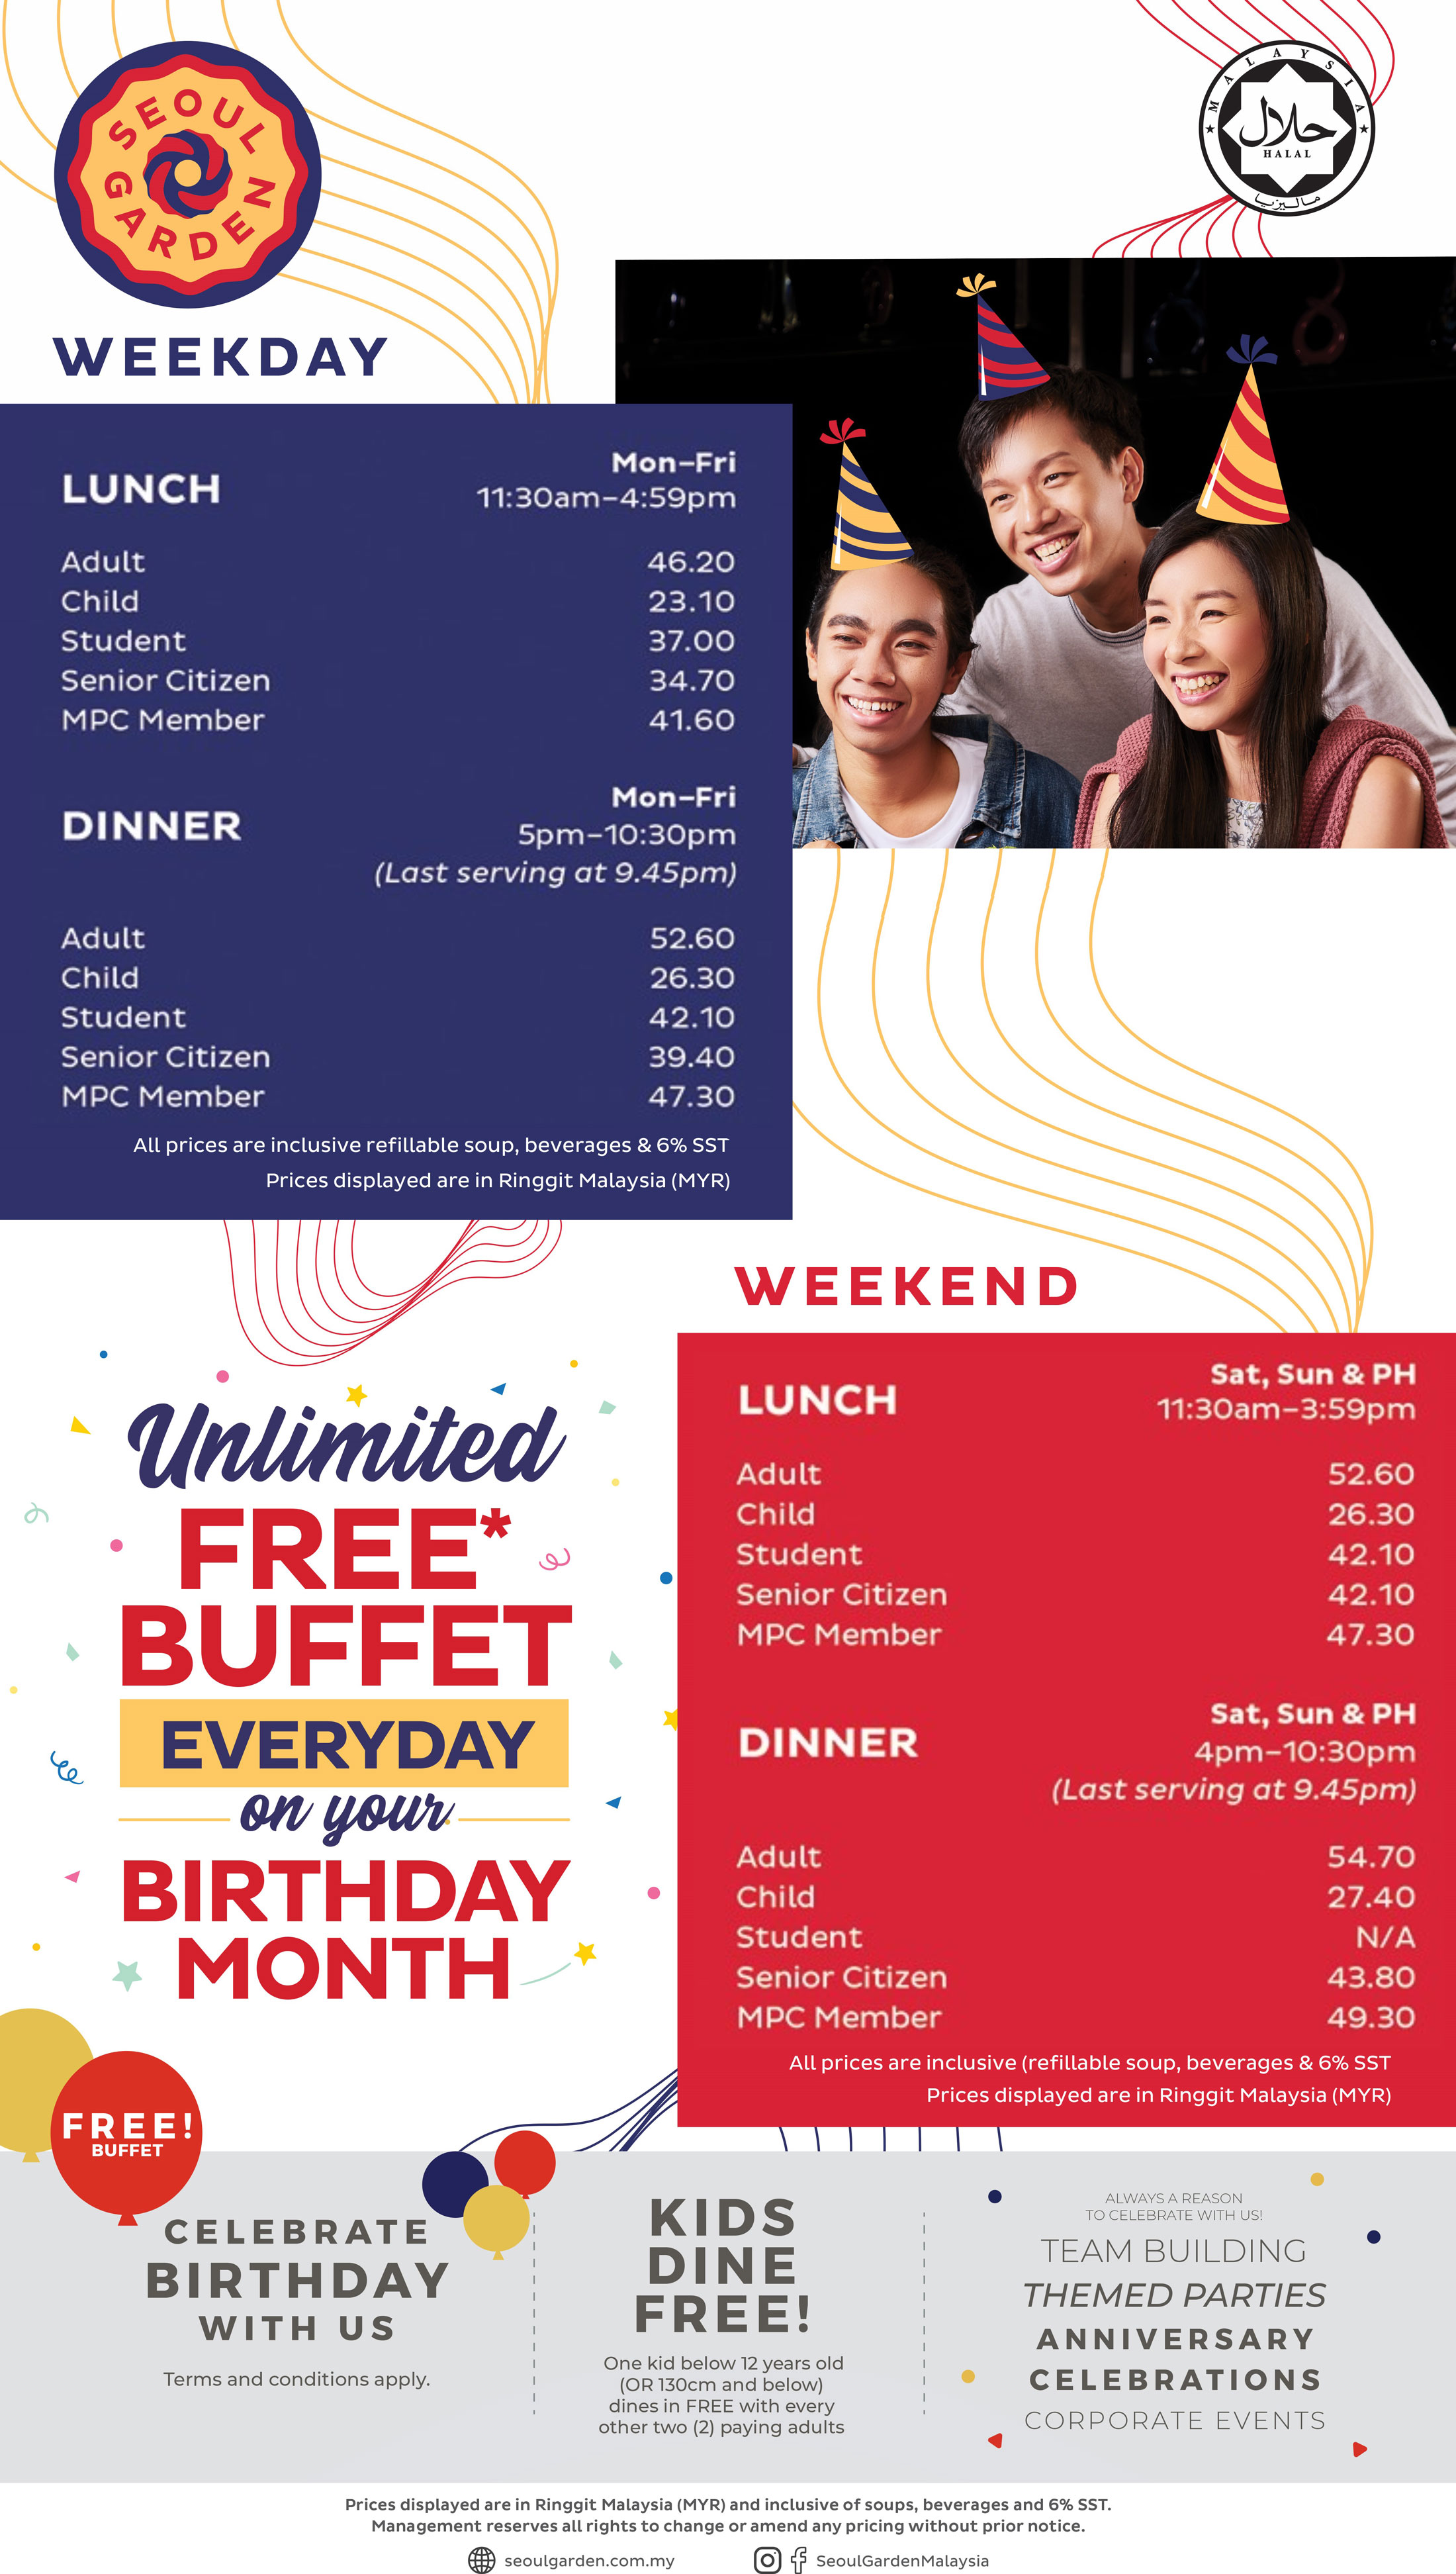 Outlets Seoul Garden Korean Asian Buffet Restaurant In Malaysia